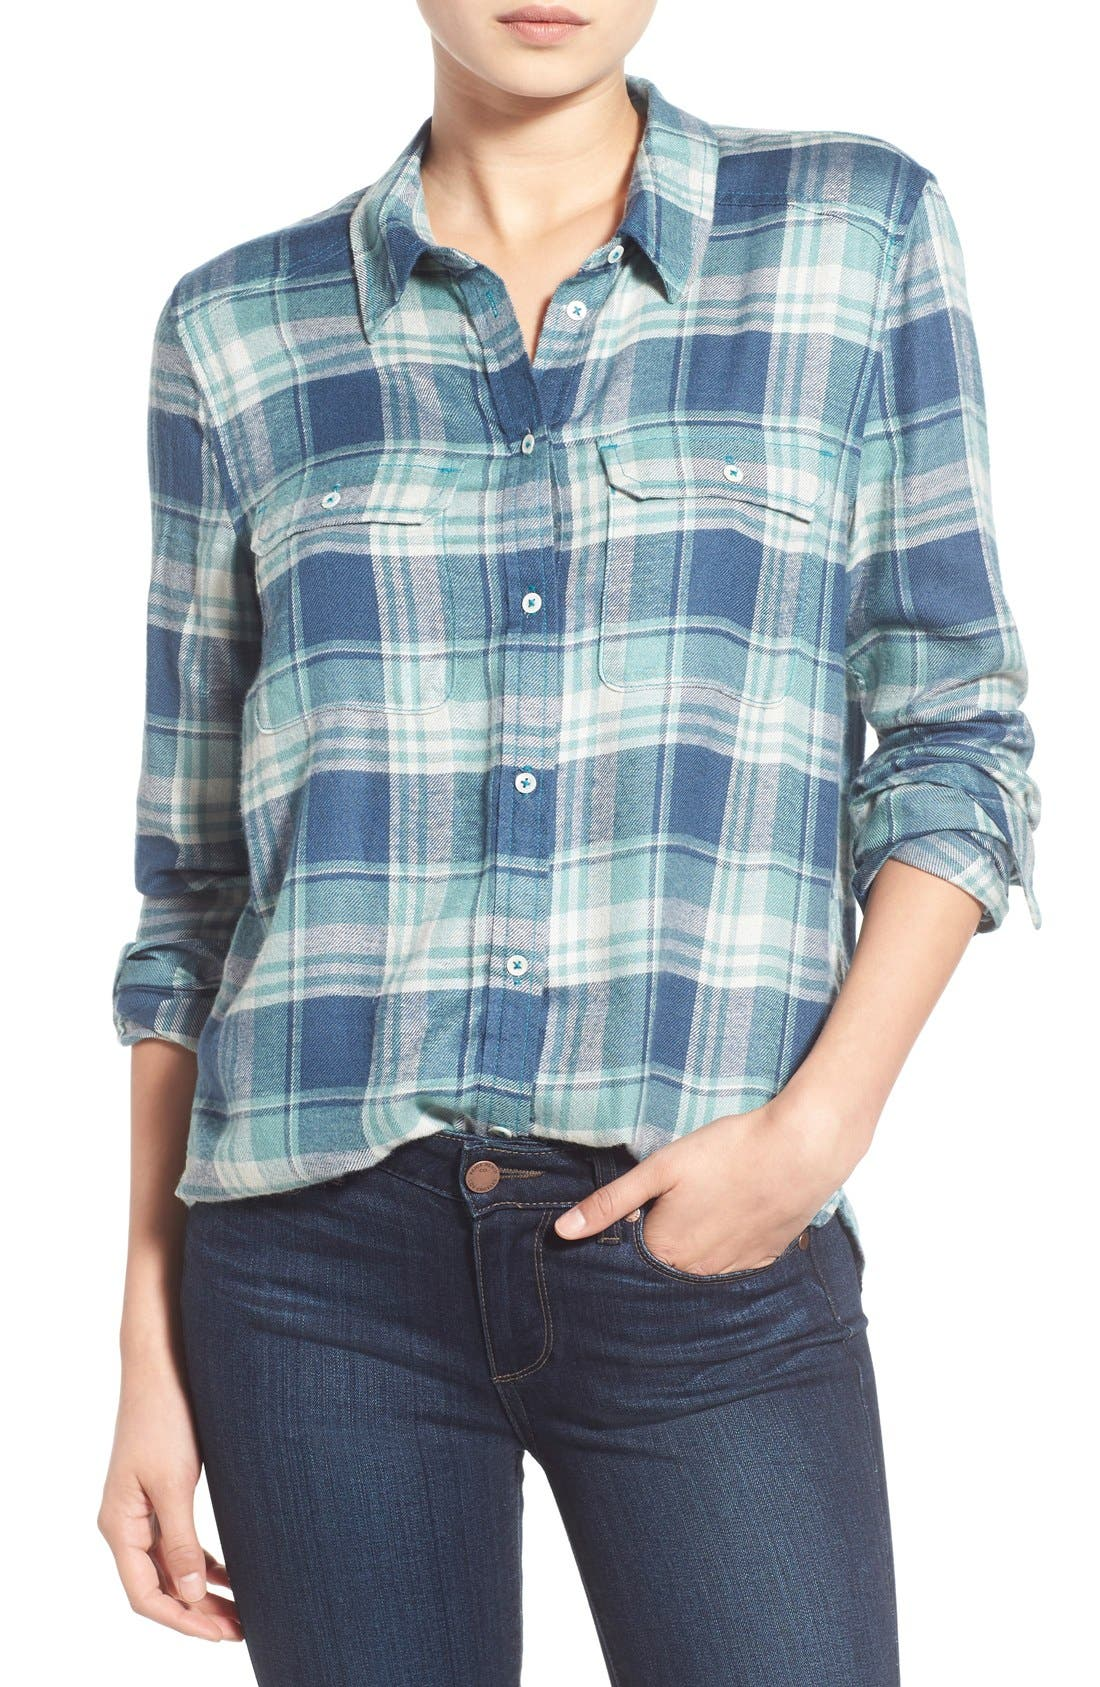 Alternate Image 1 Selected - Paige Denim 'Trudy' Plaid Shirt